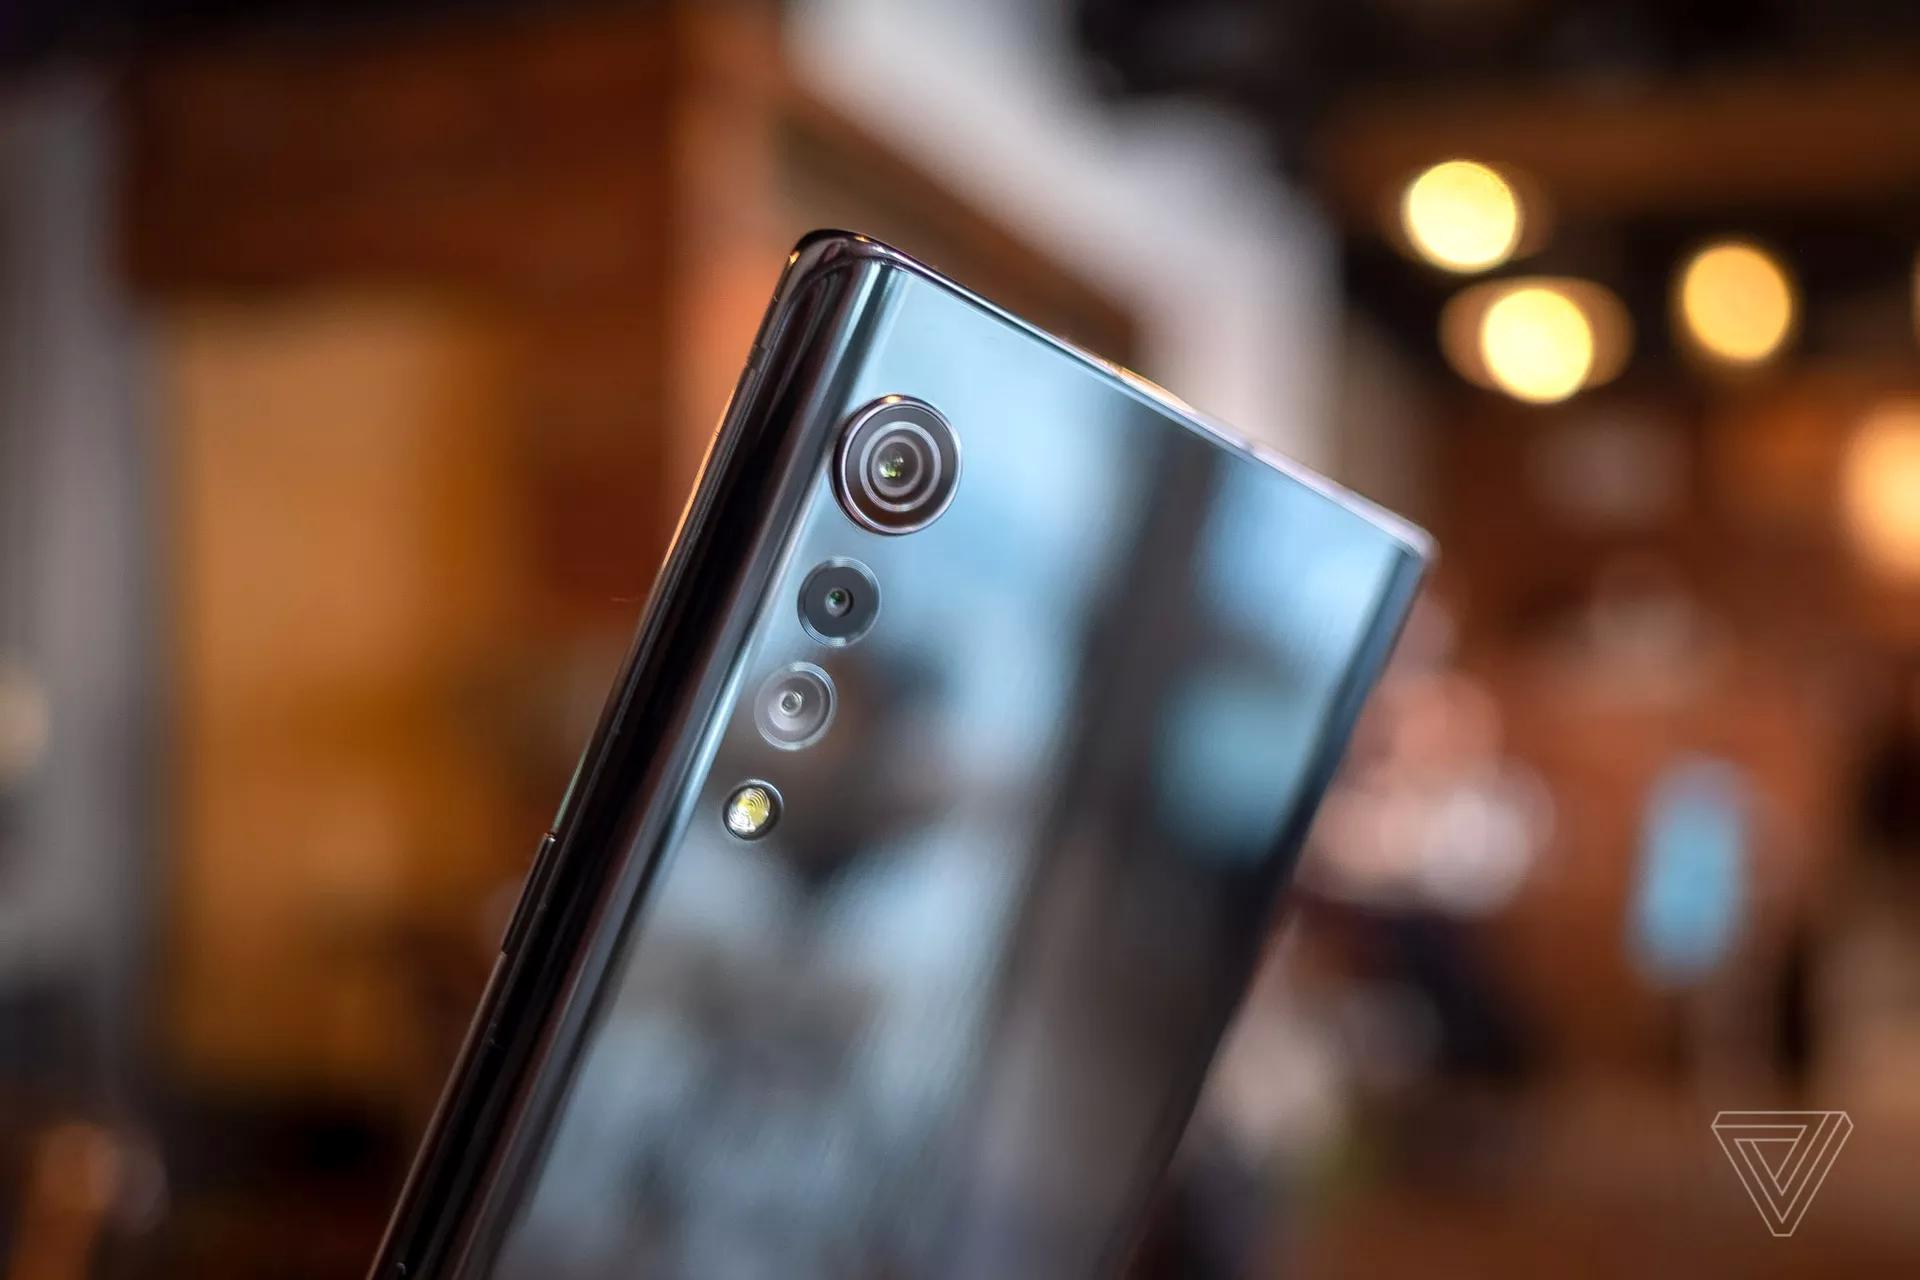 LG VELVET深度测评,看似光滑的屏幕值得买吗